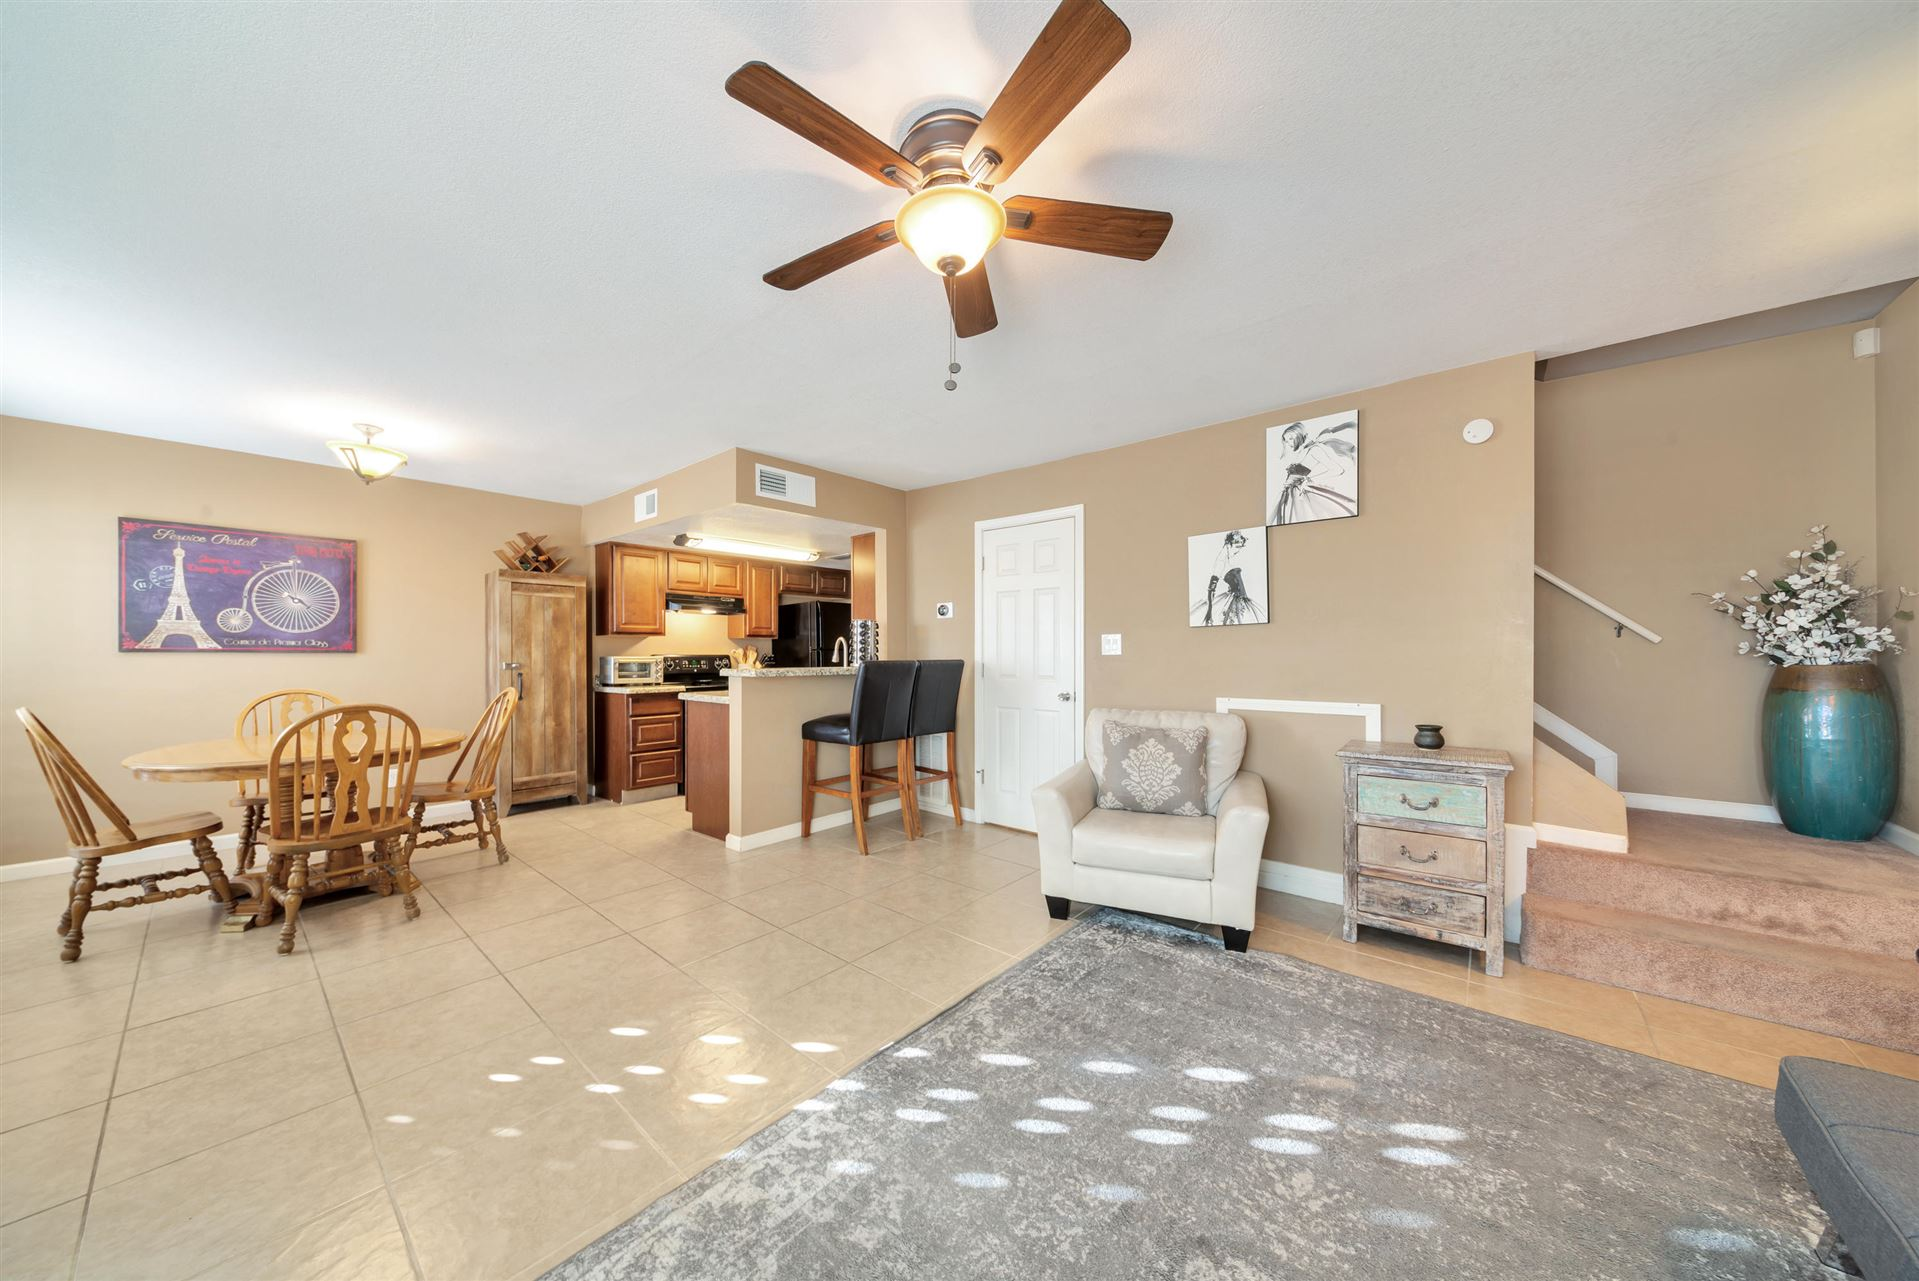 Photo of 14405 N BOXWOOD Lane #C, Fountain Hills, AZ 85268 (MLS # 6226800)